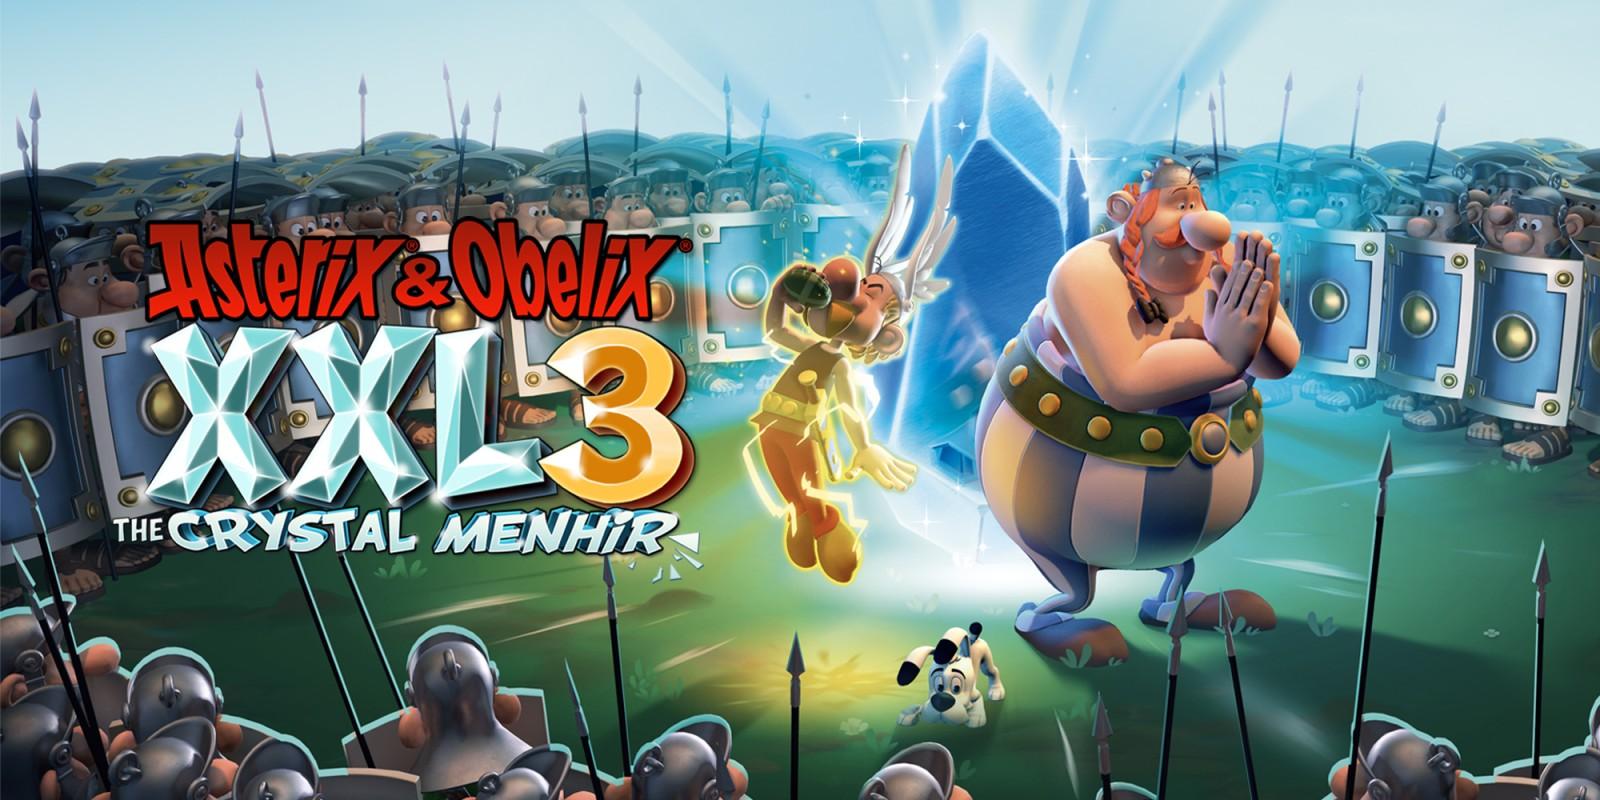 Asterix & Obelix XXL 3: The Crystal Menhir. Продолжение, которого не ждали